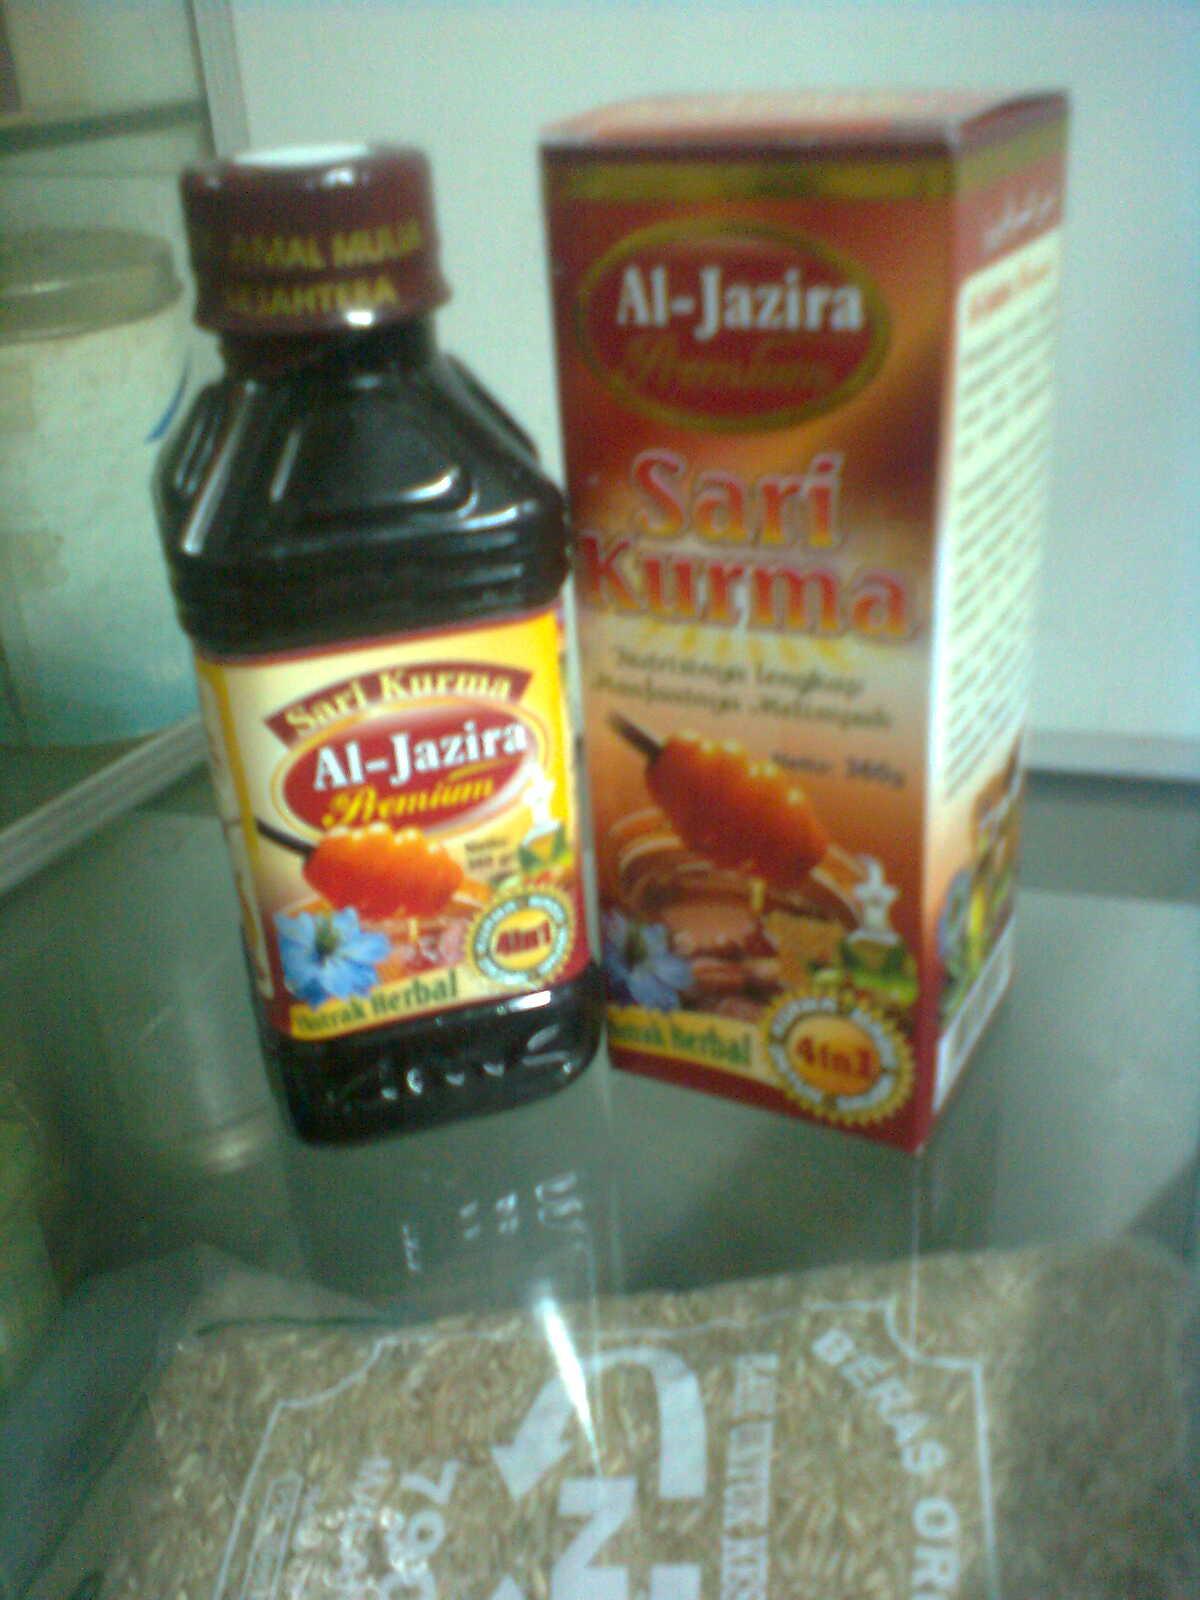 Sayur Organikproduk Herbalakar Wangi Shop Malang Maret 2012 Sari Kurma Aljazira Harga Eceran Untuk Al Jazira Premium Rp27rb